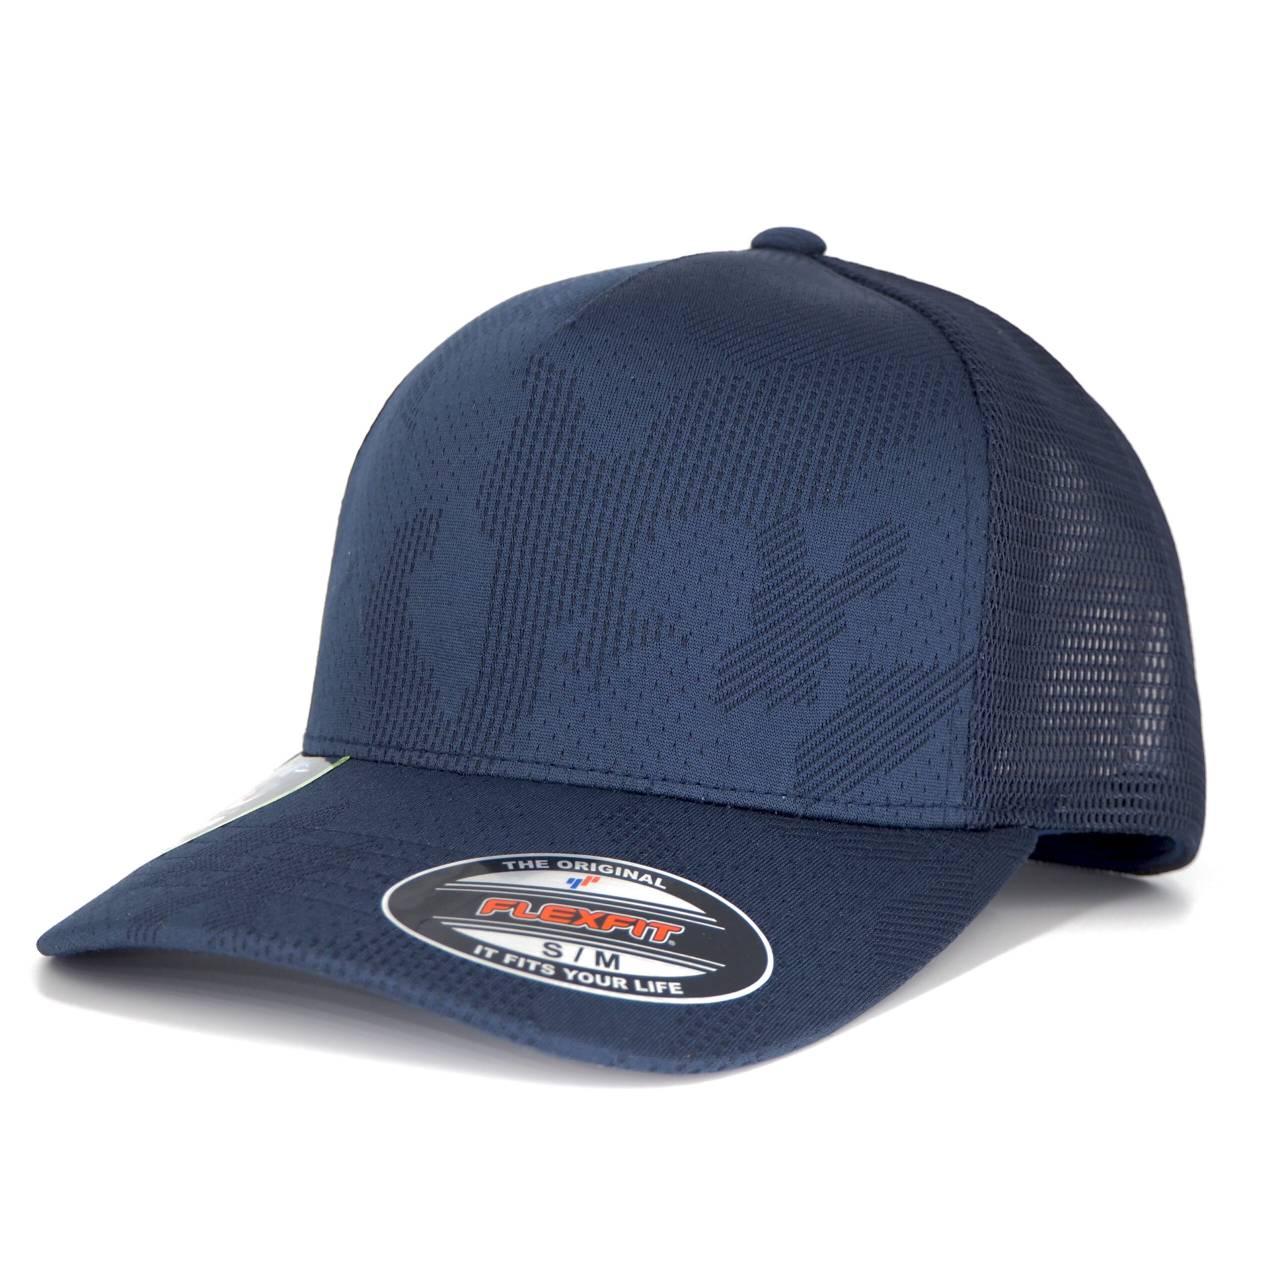 6277JC-00155-0044 FLEXFIT JAQUARD CAMO STRETCH CAMO CAP